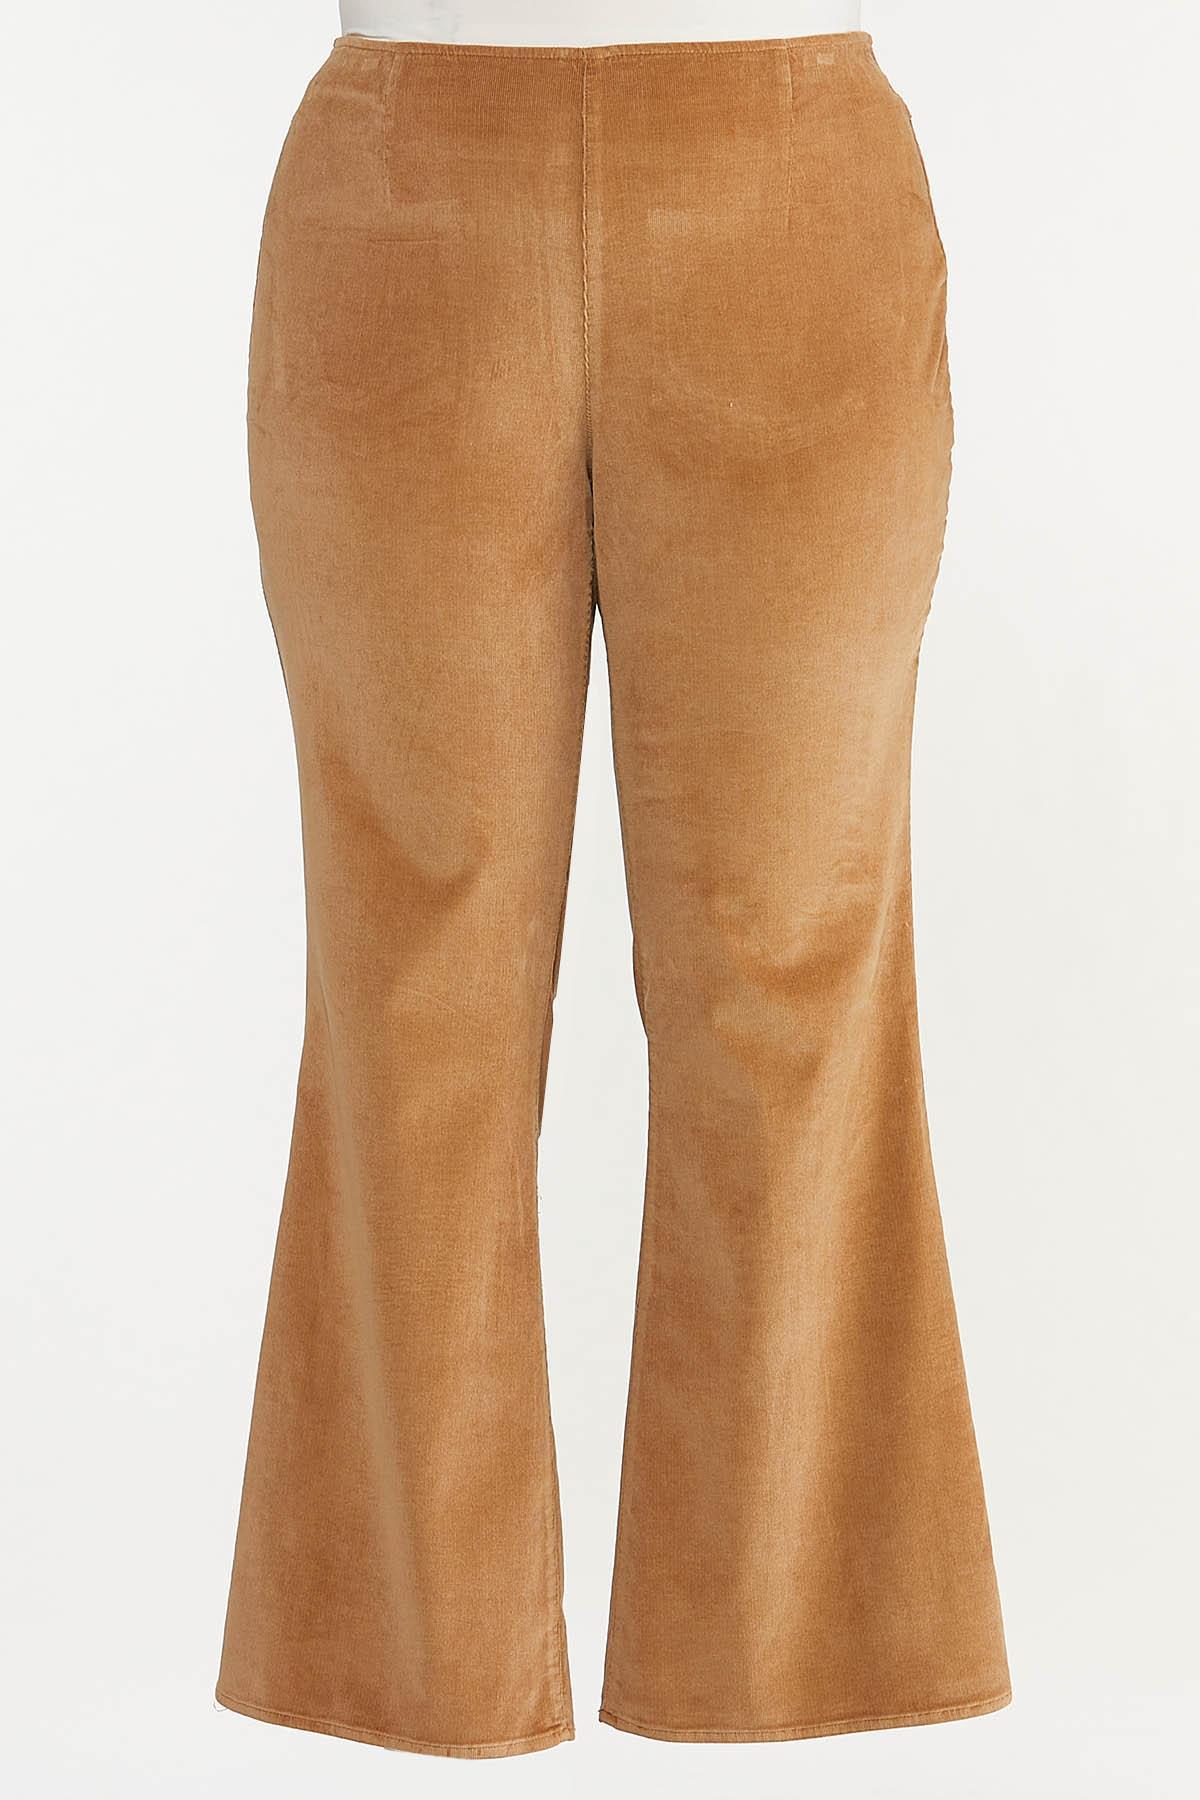 Plus Size Corduroy Flare Pants